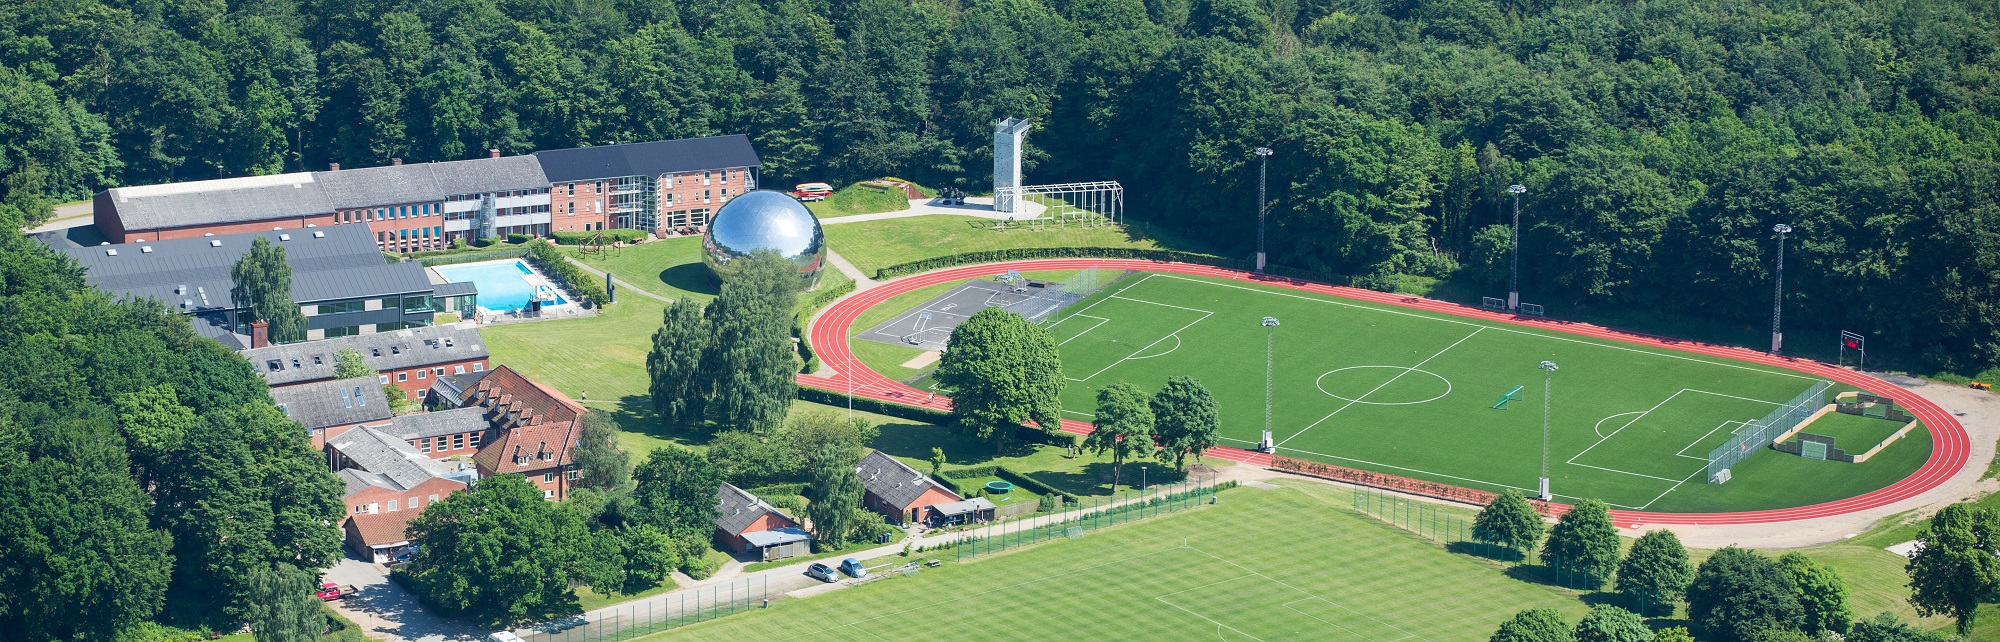 Luftfoto af Vejle Idrætsefterskole